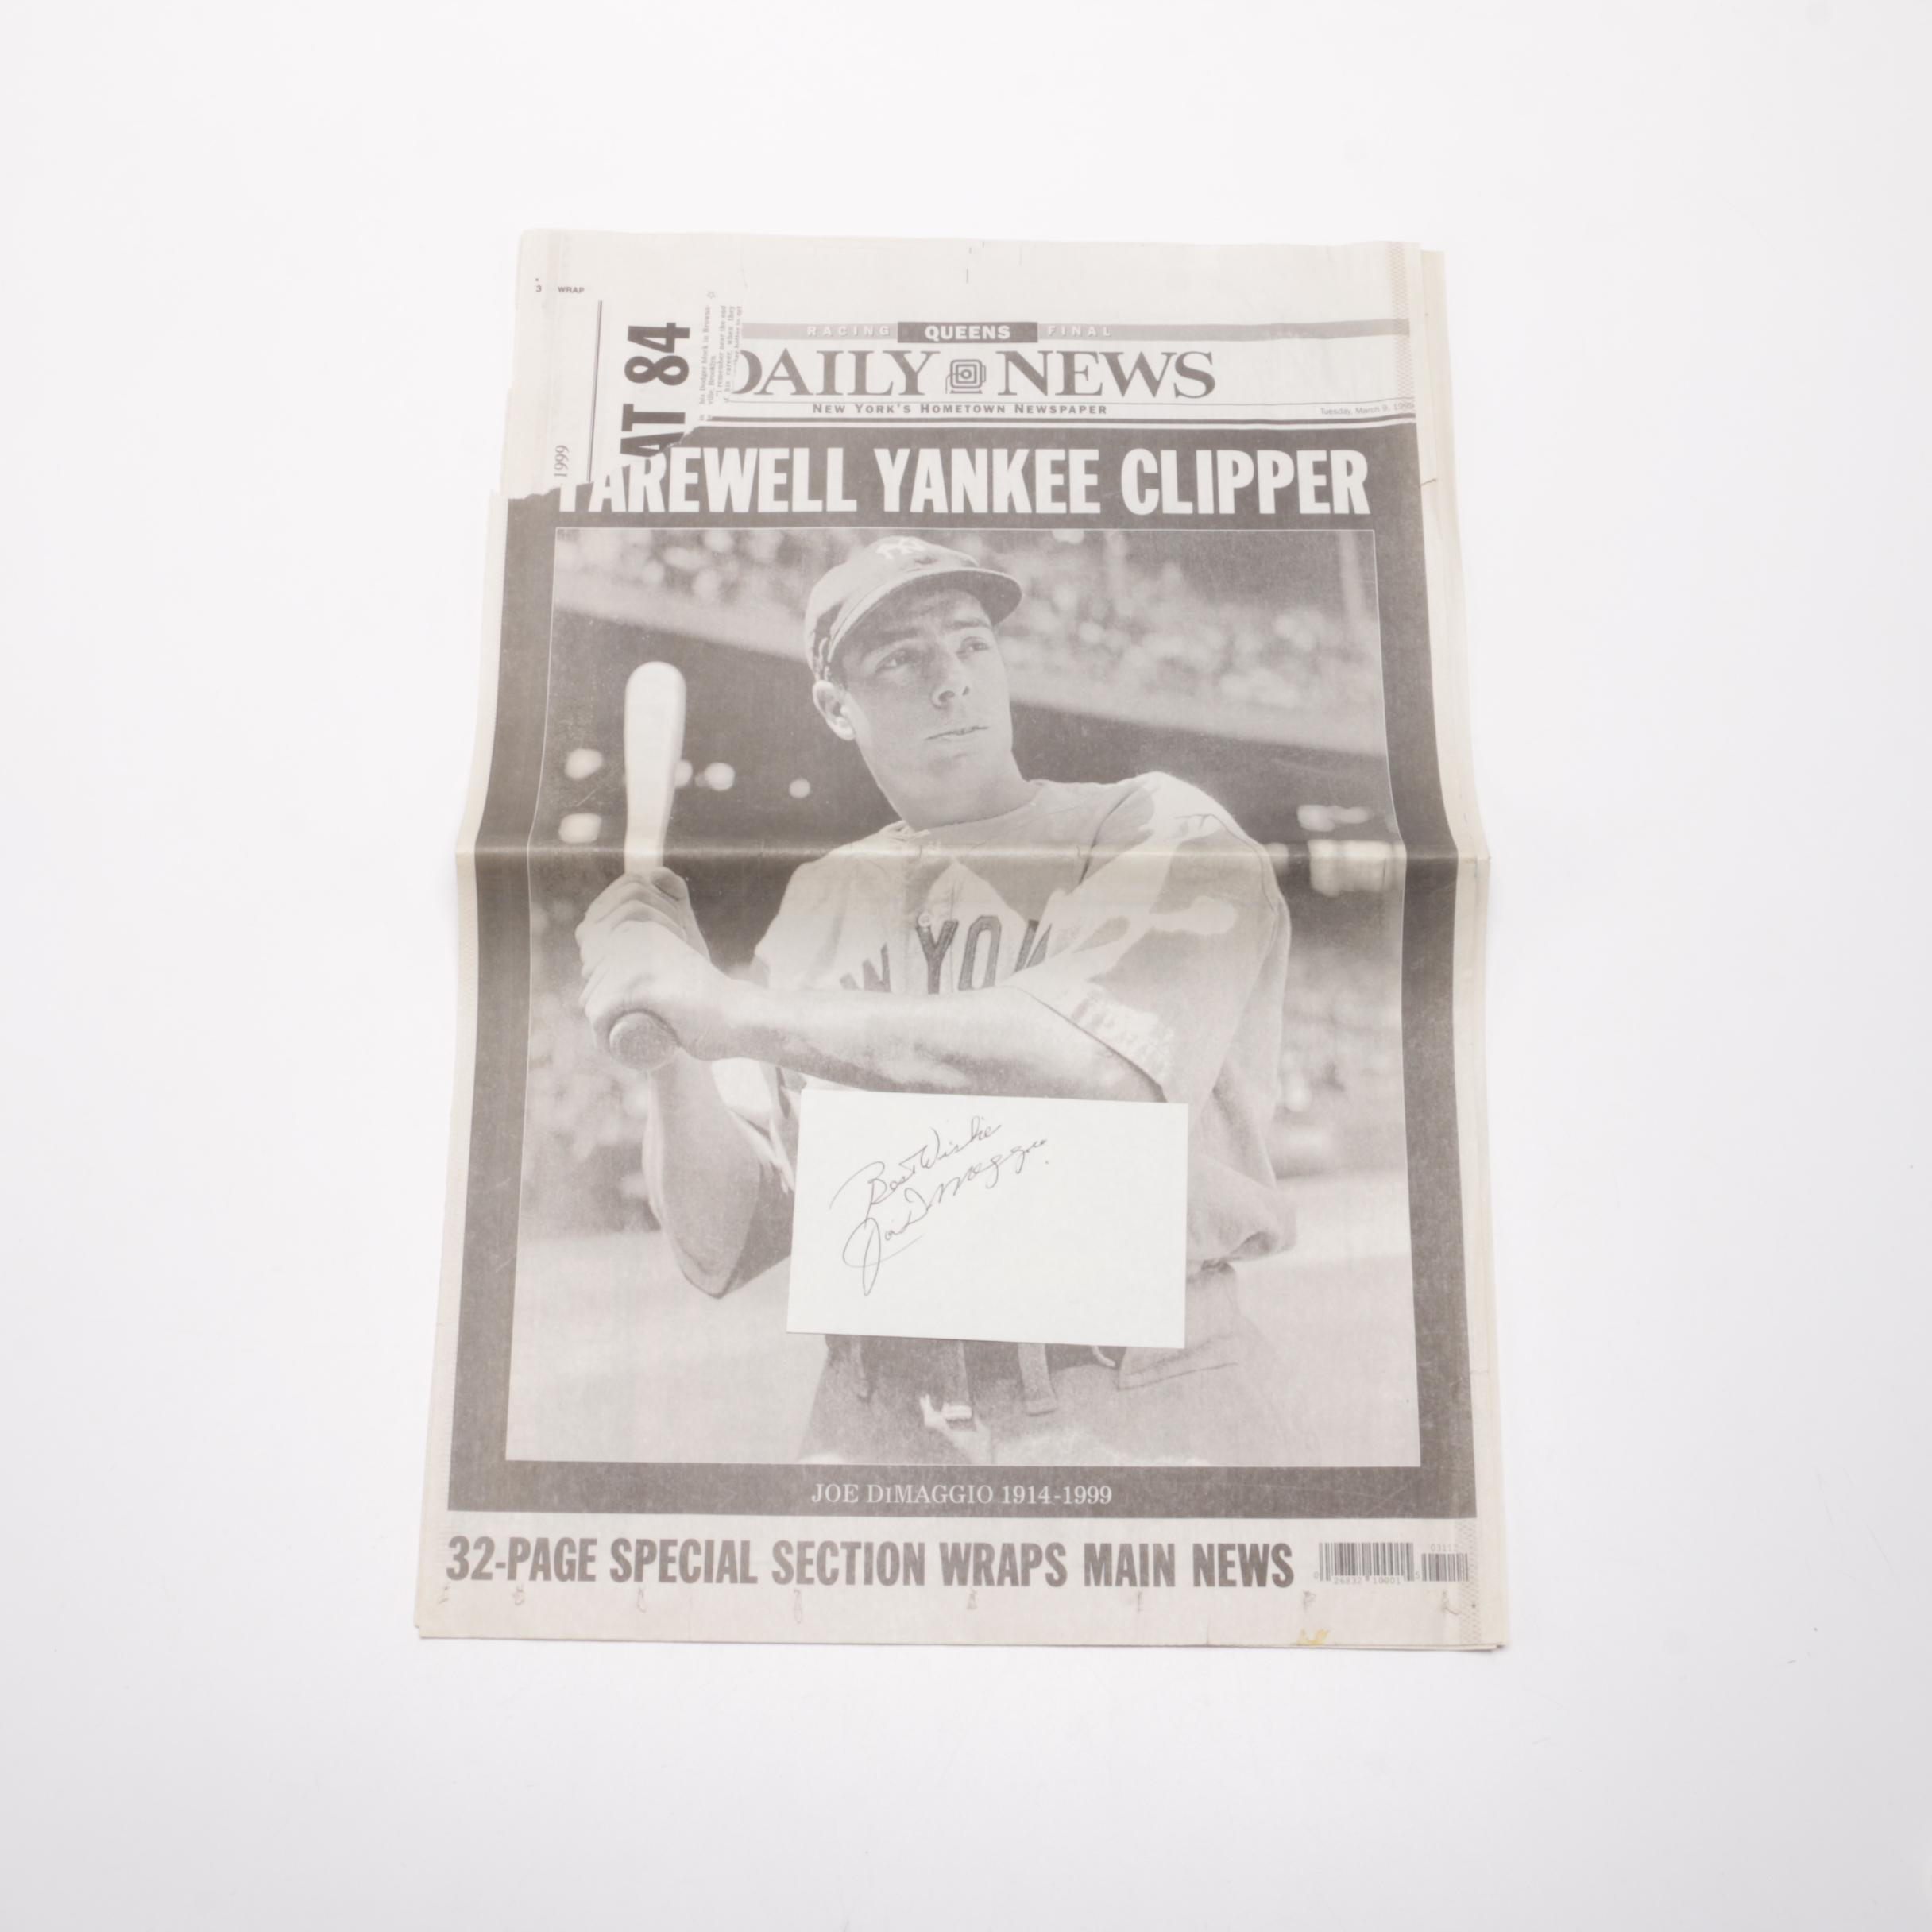 "Joe DiMaggio Autograph and ""Farewell Yankee Clipper"" Newspaper Article"